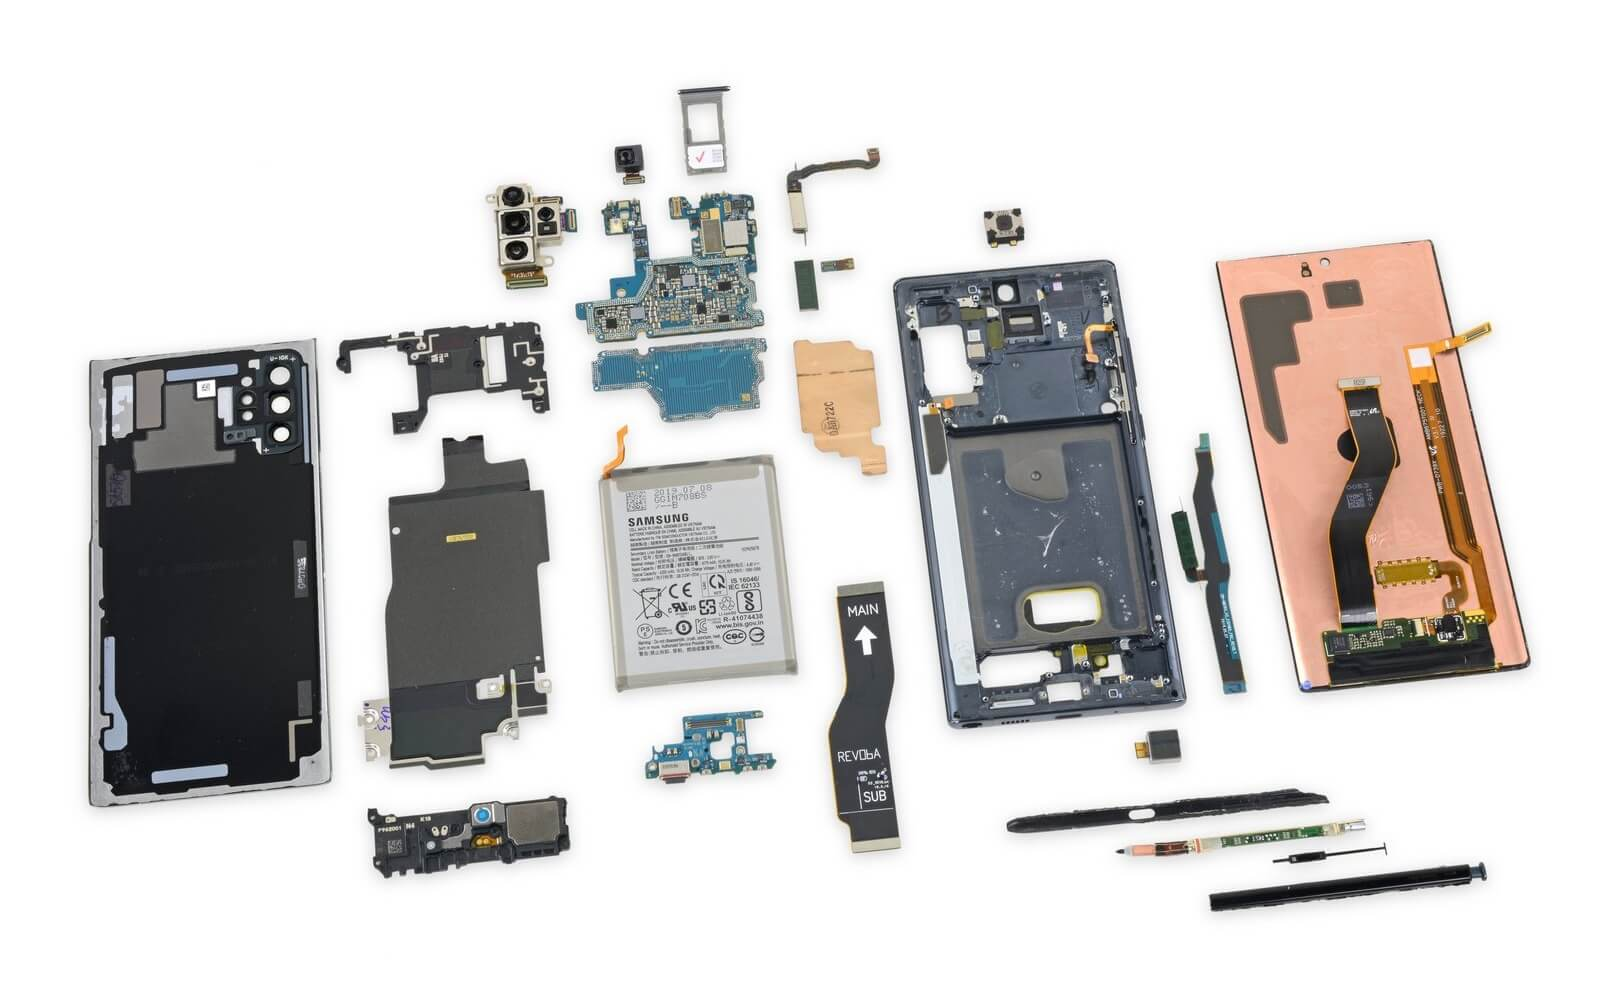 Samsung Galaxy Note10 Plus 5G iFixit